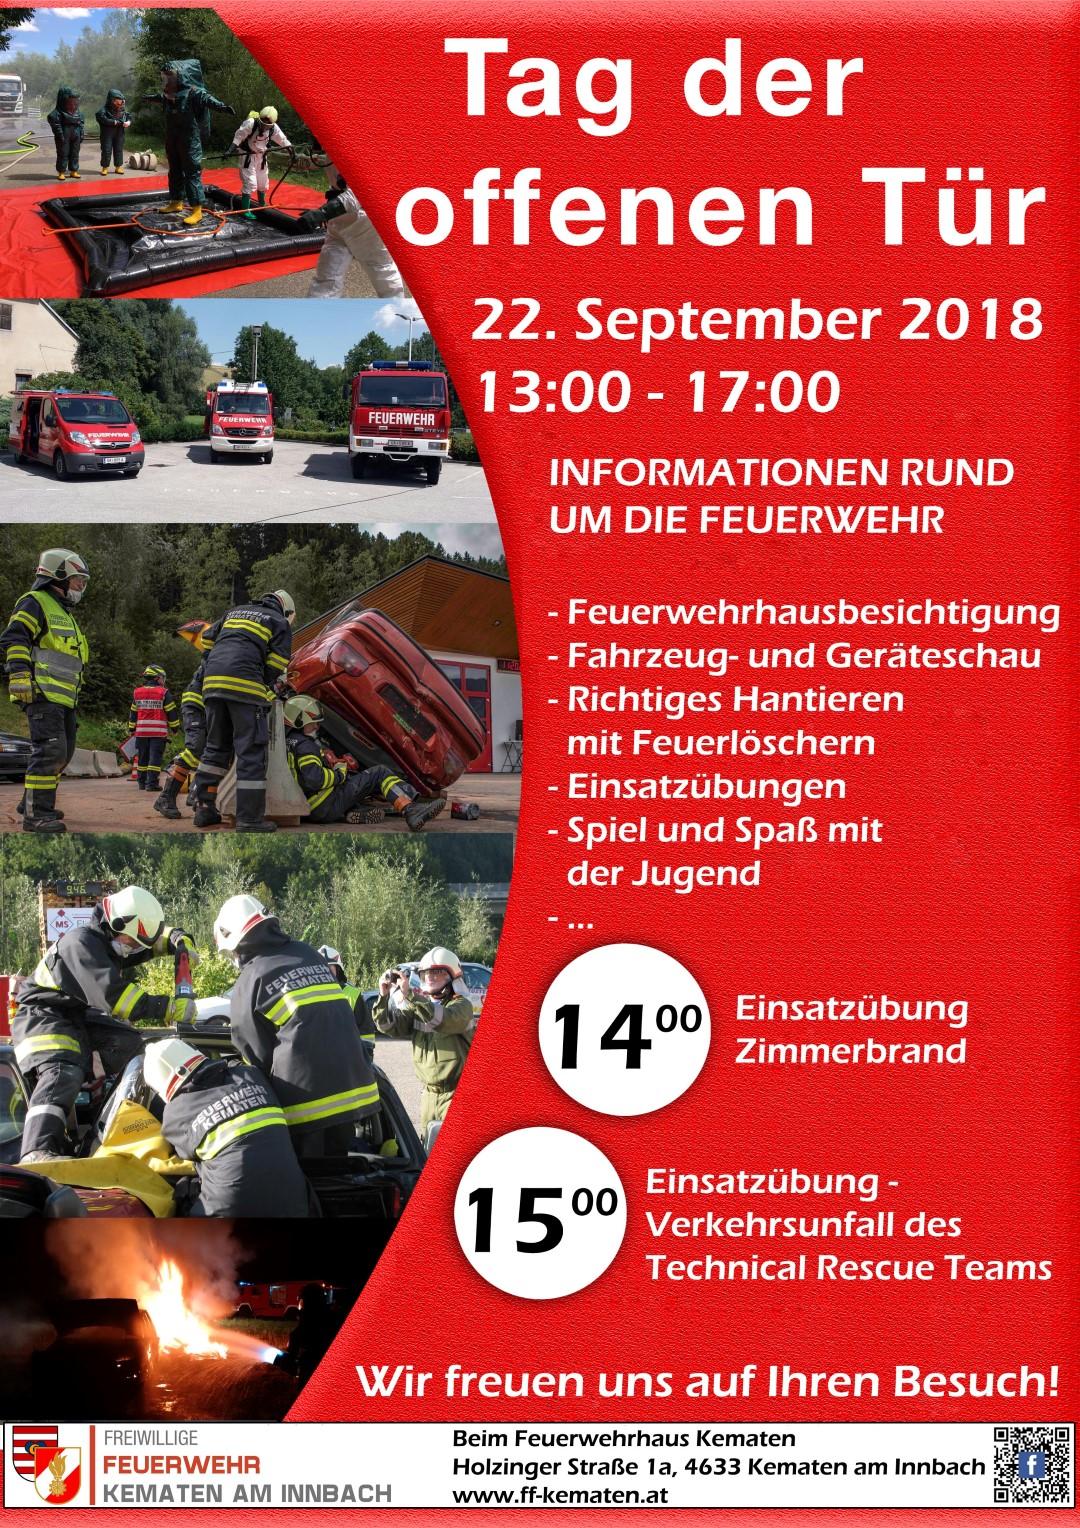 Tag der offenen Tür – FF Kematen am Innbach